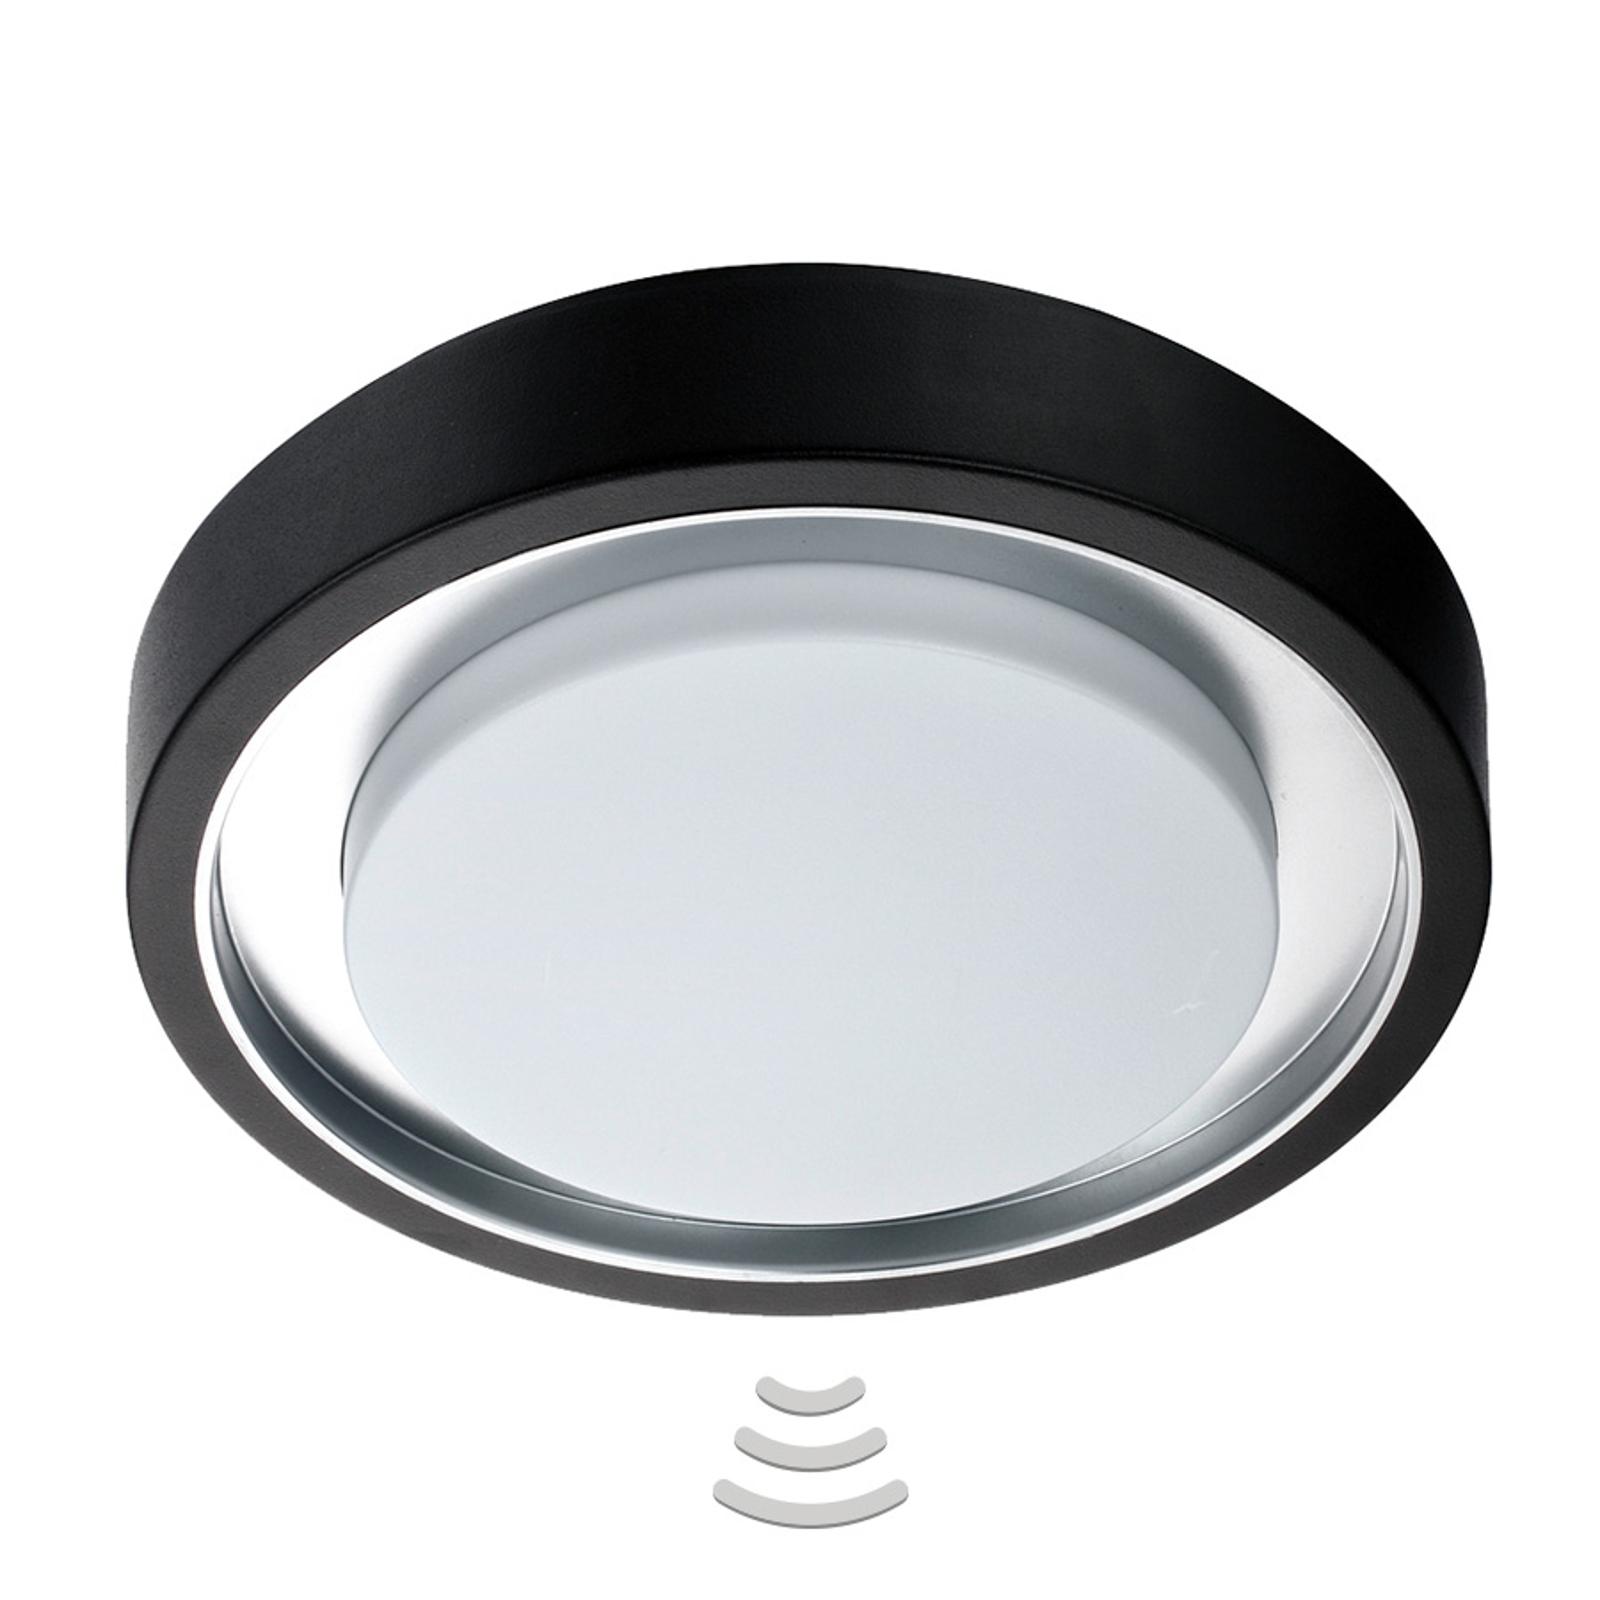 Zewnętrzna lampa sufitowa LED Toki Sensor